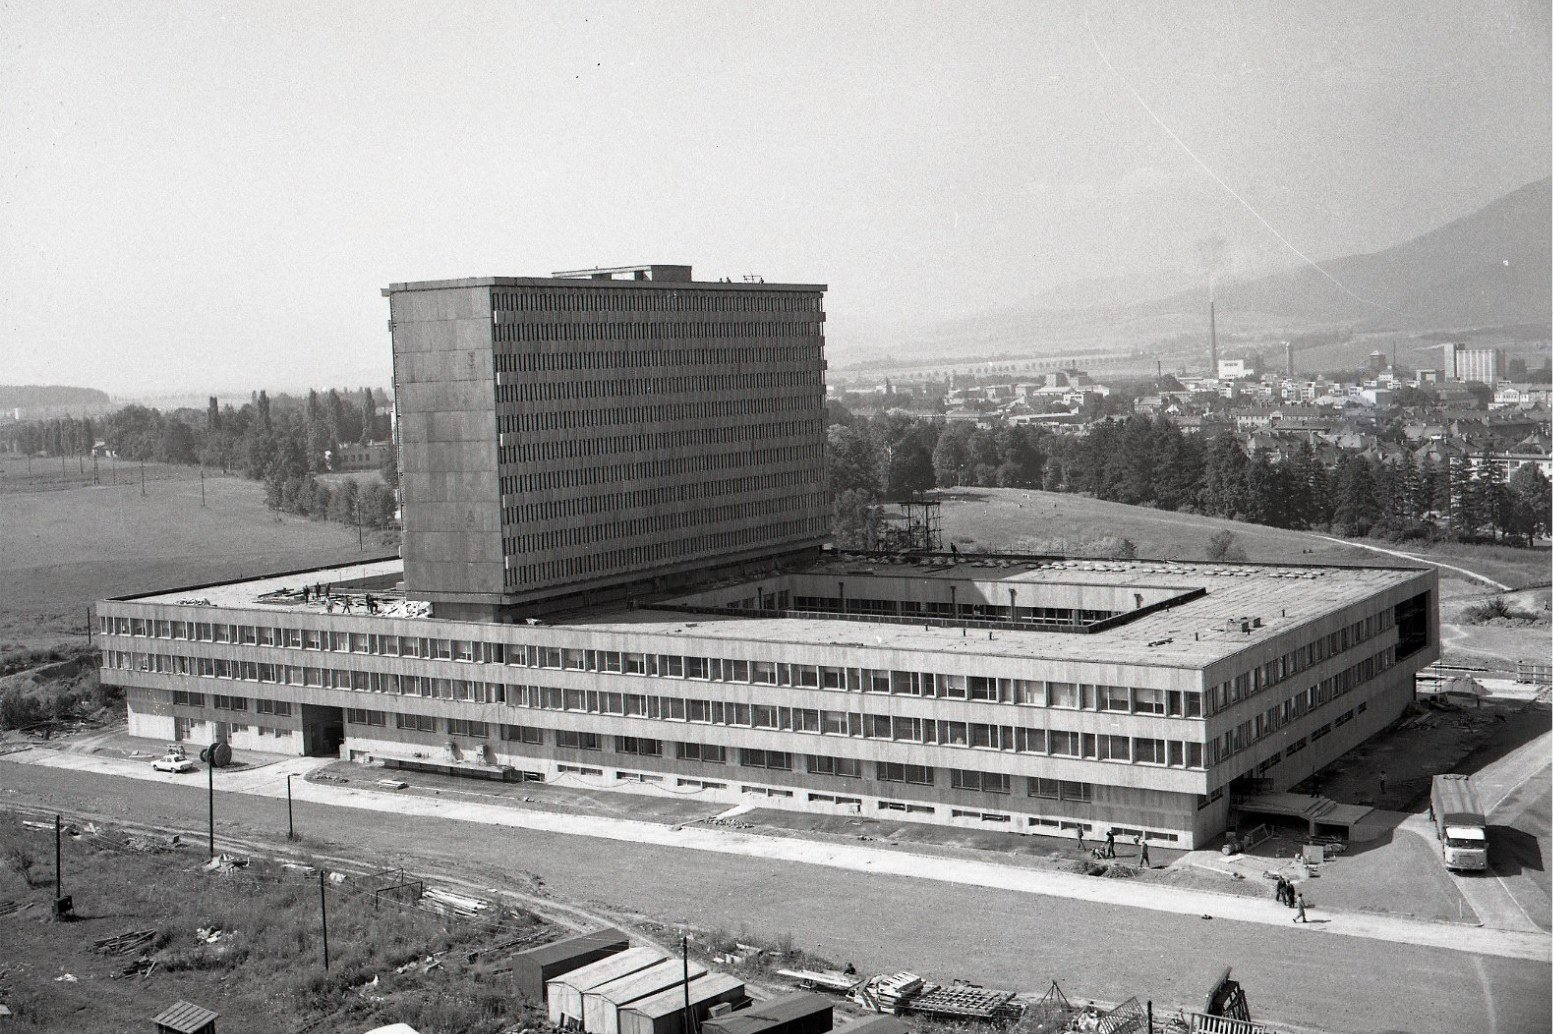 Matica Slovenská, 1975